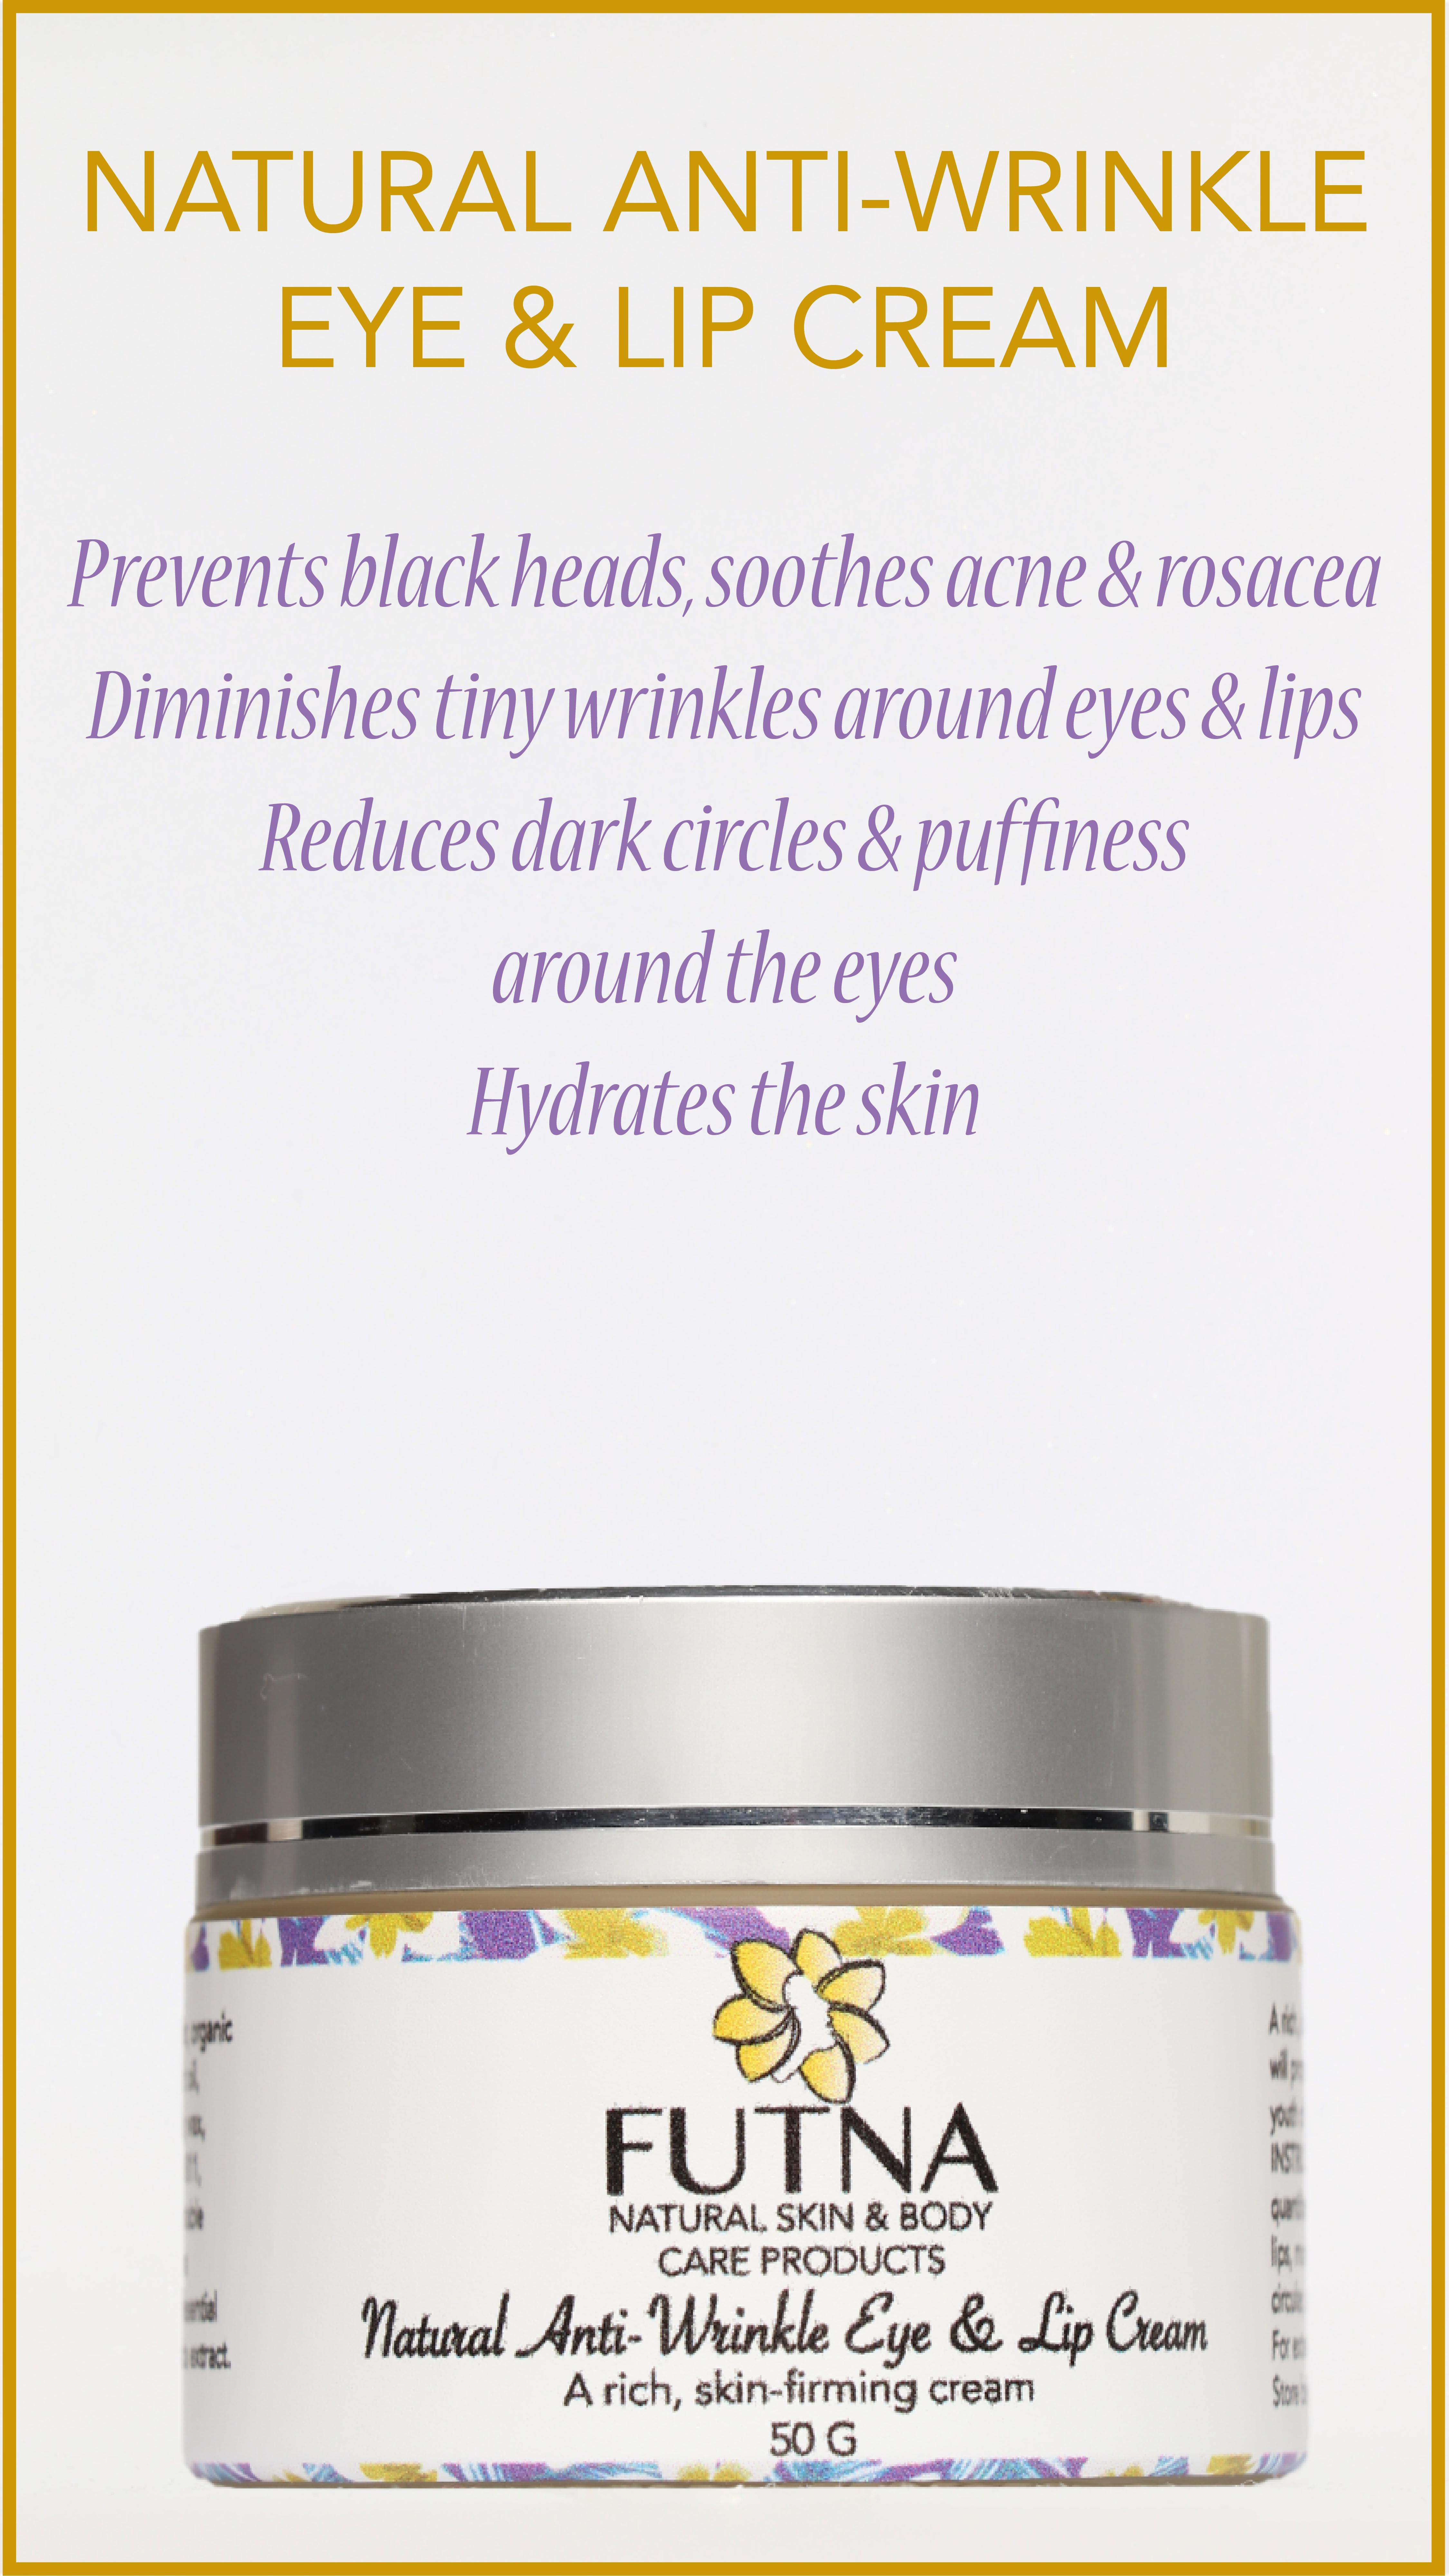 Natural Anti-Wrinkle Eye & Lip Cream